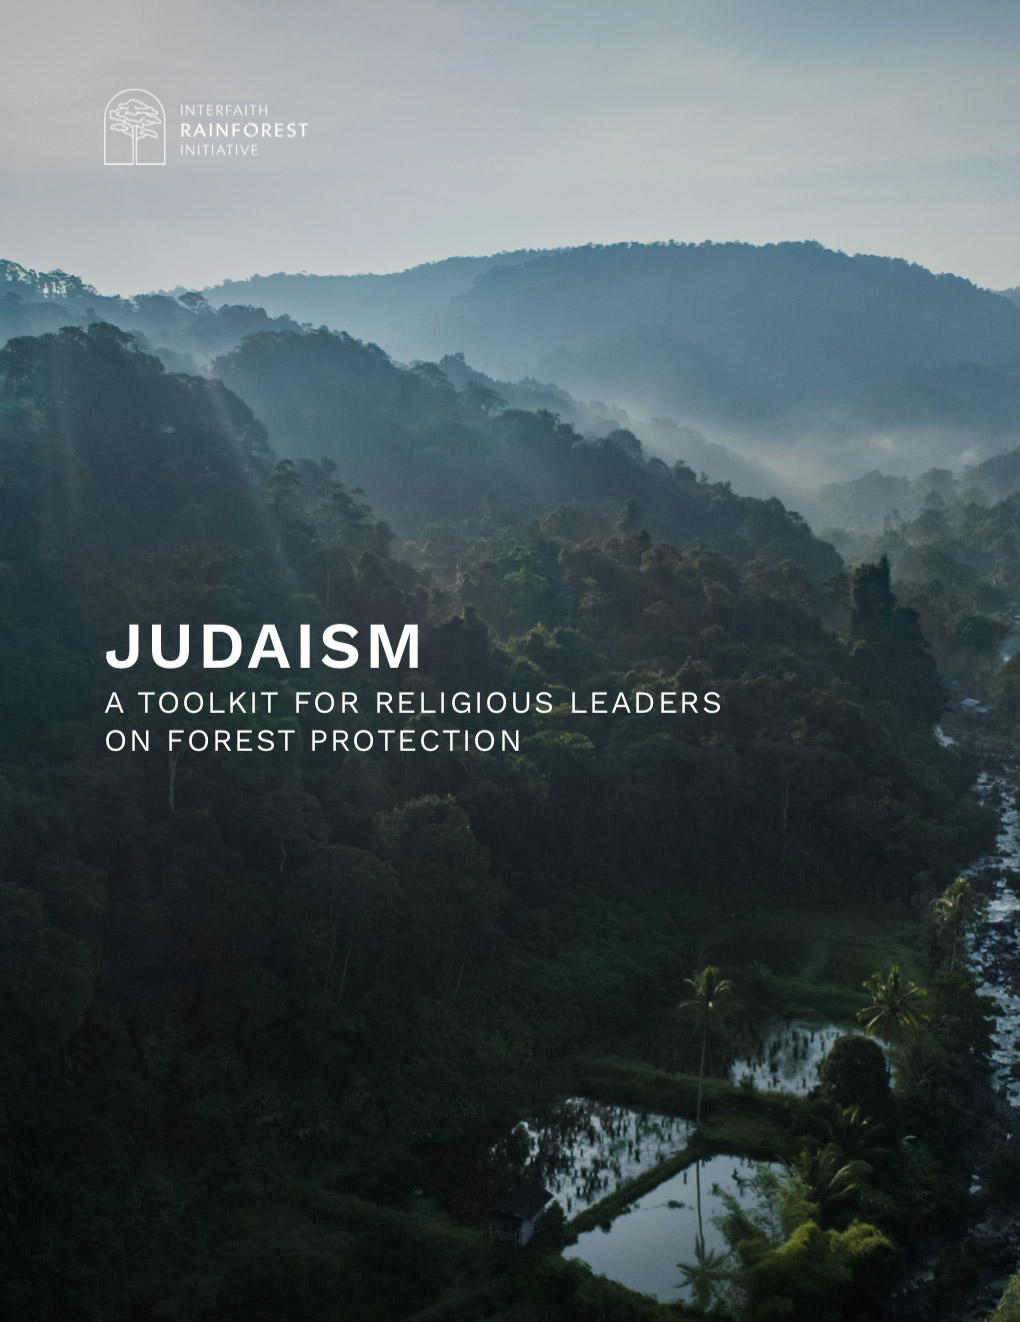 judaism-toolkit.jpg